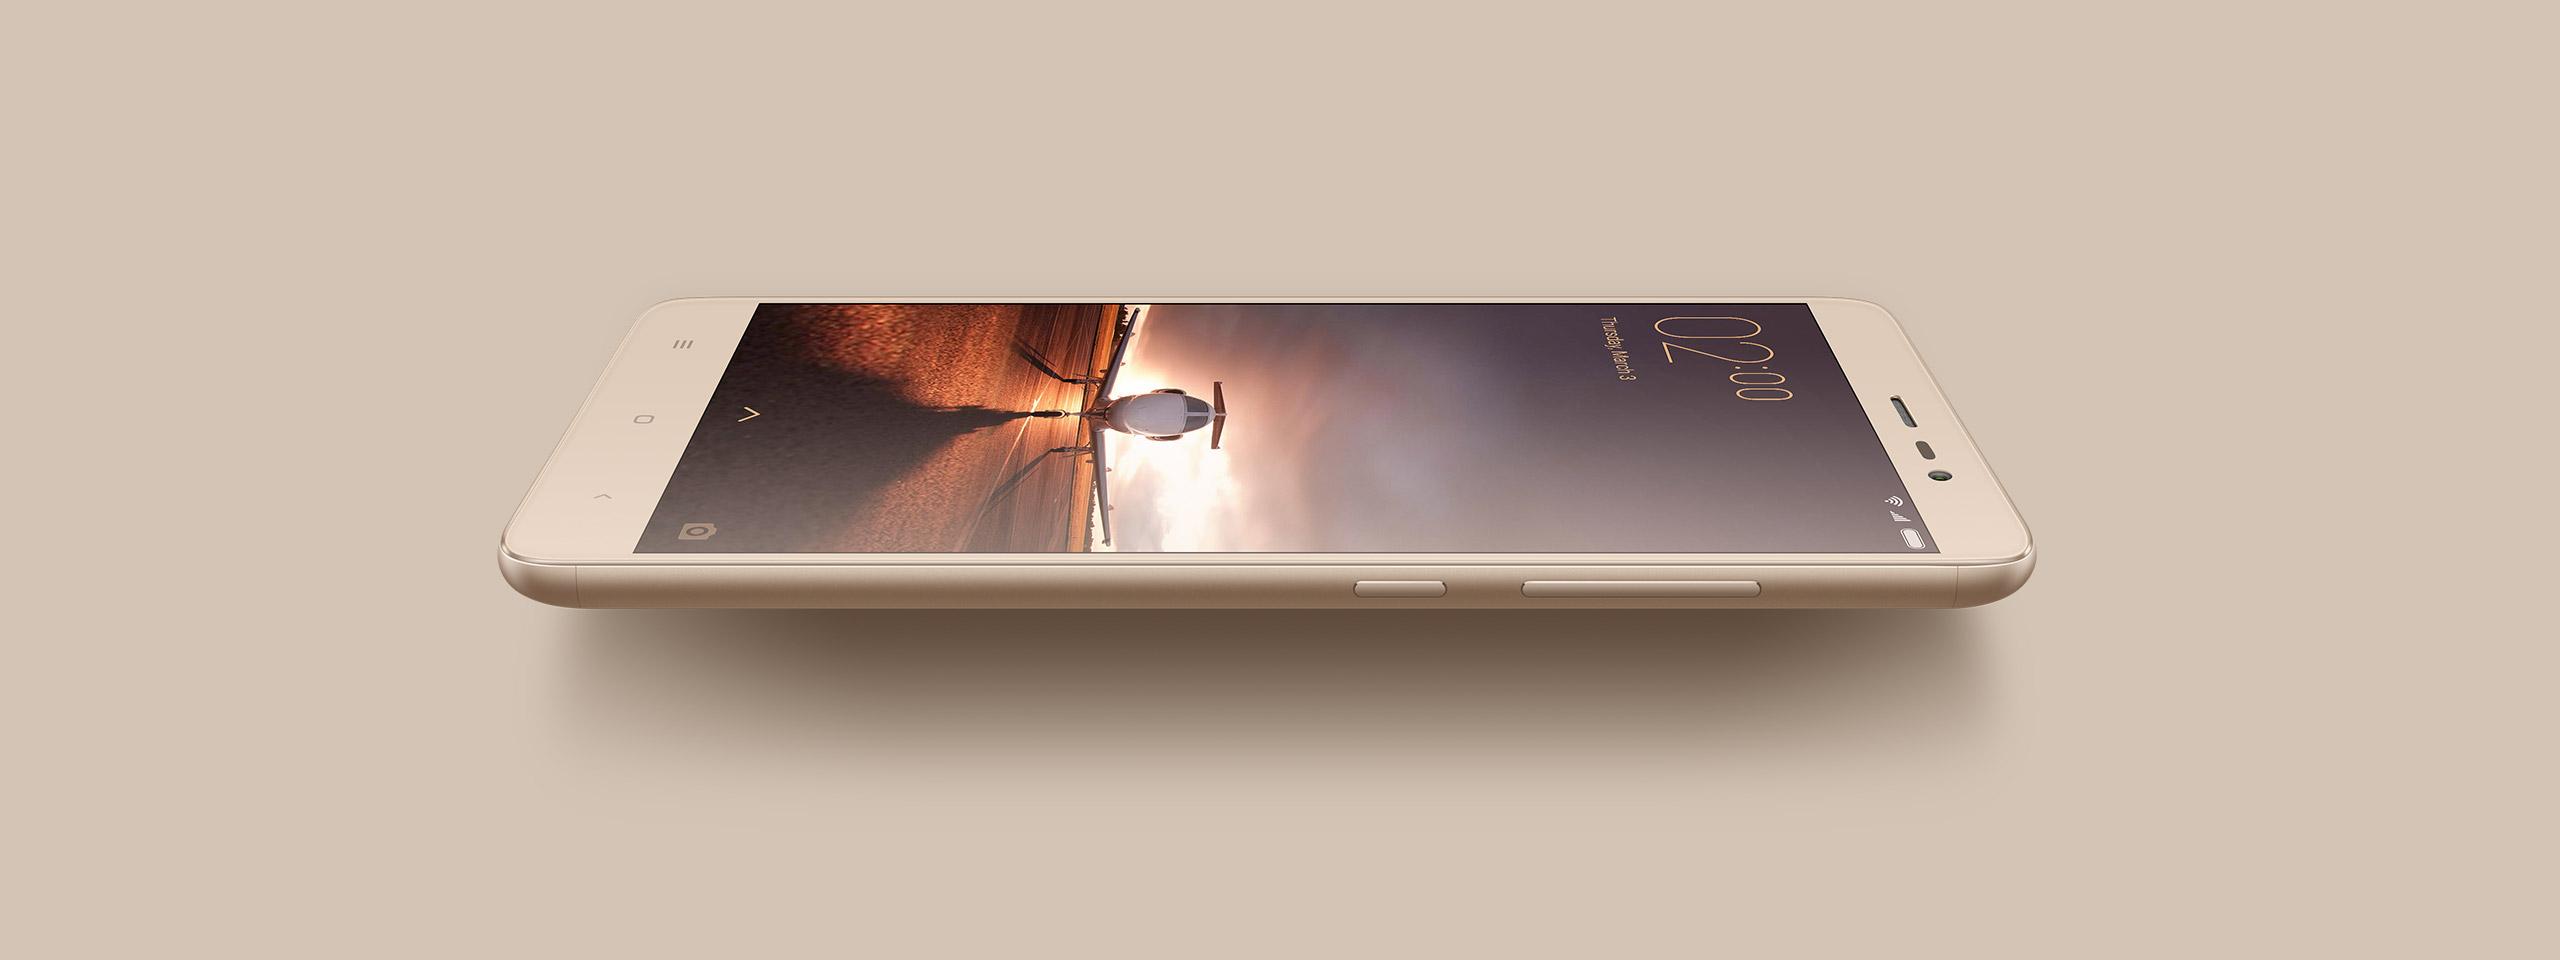 Redmi Note 3 (32GB Gold)